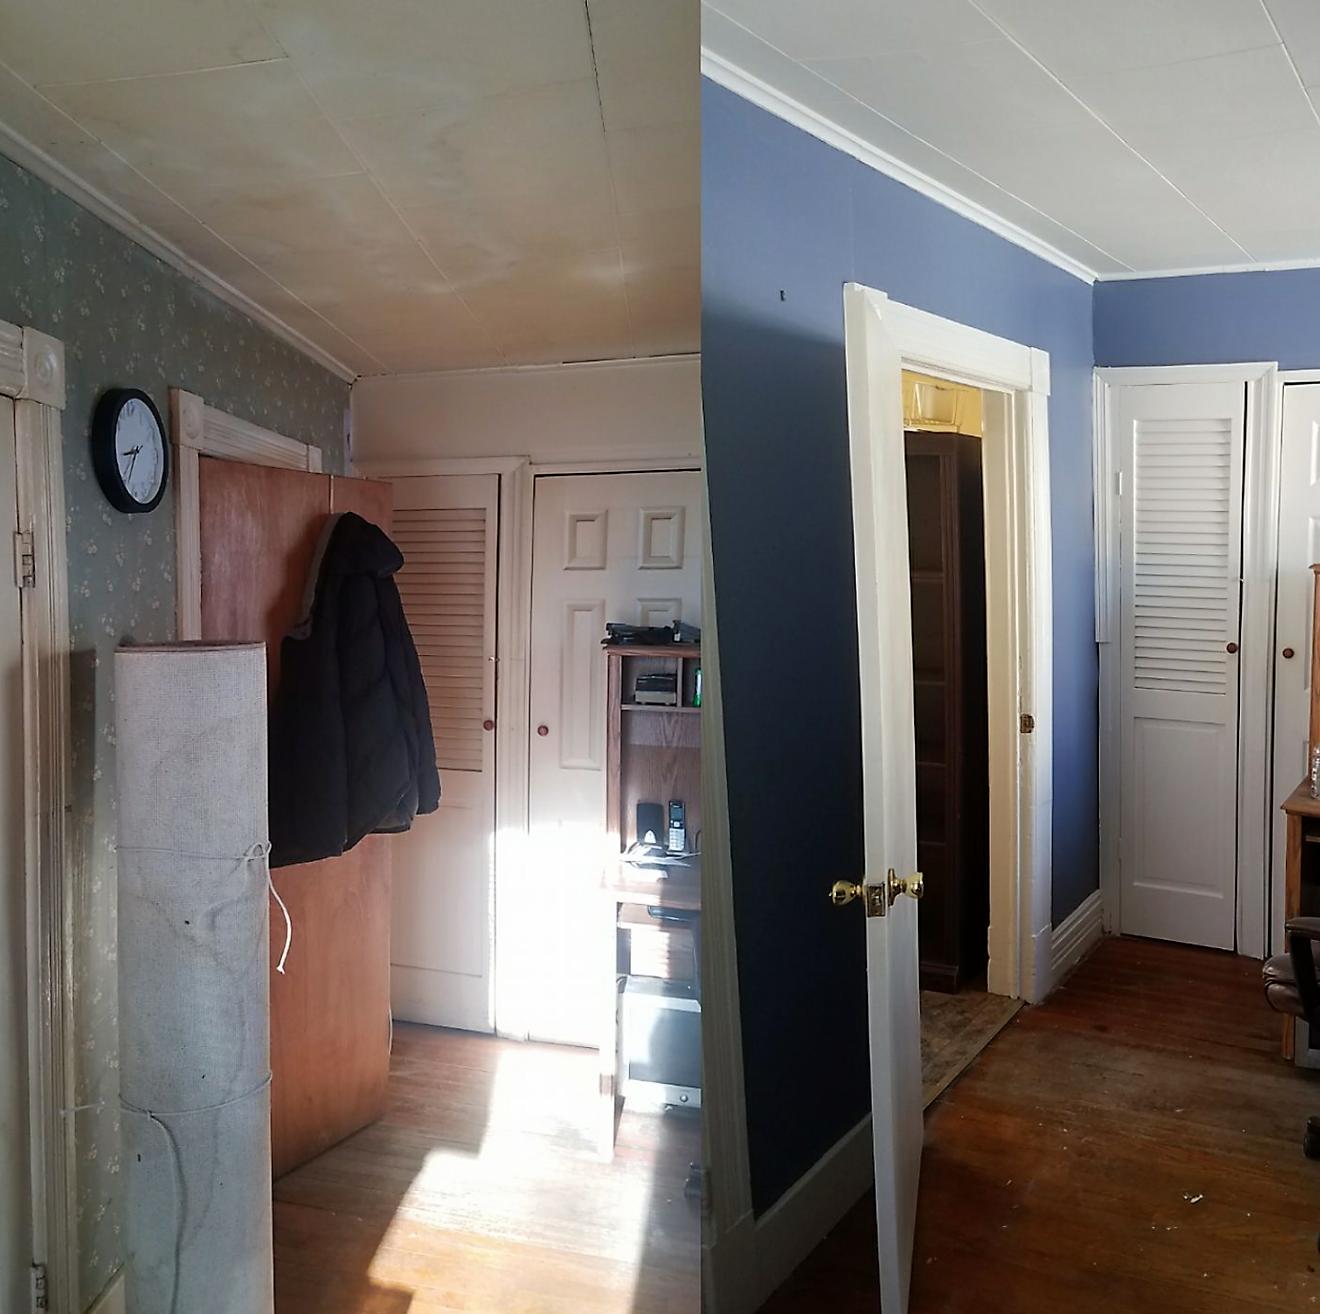 interior 2.png